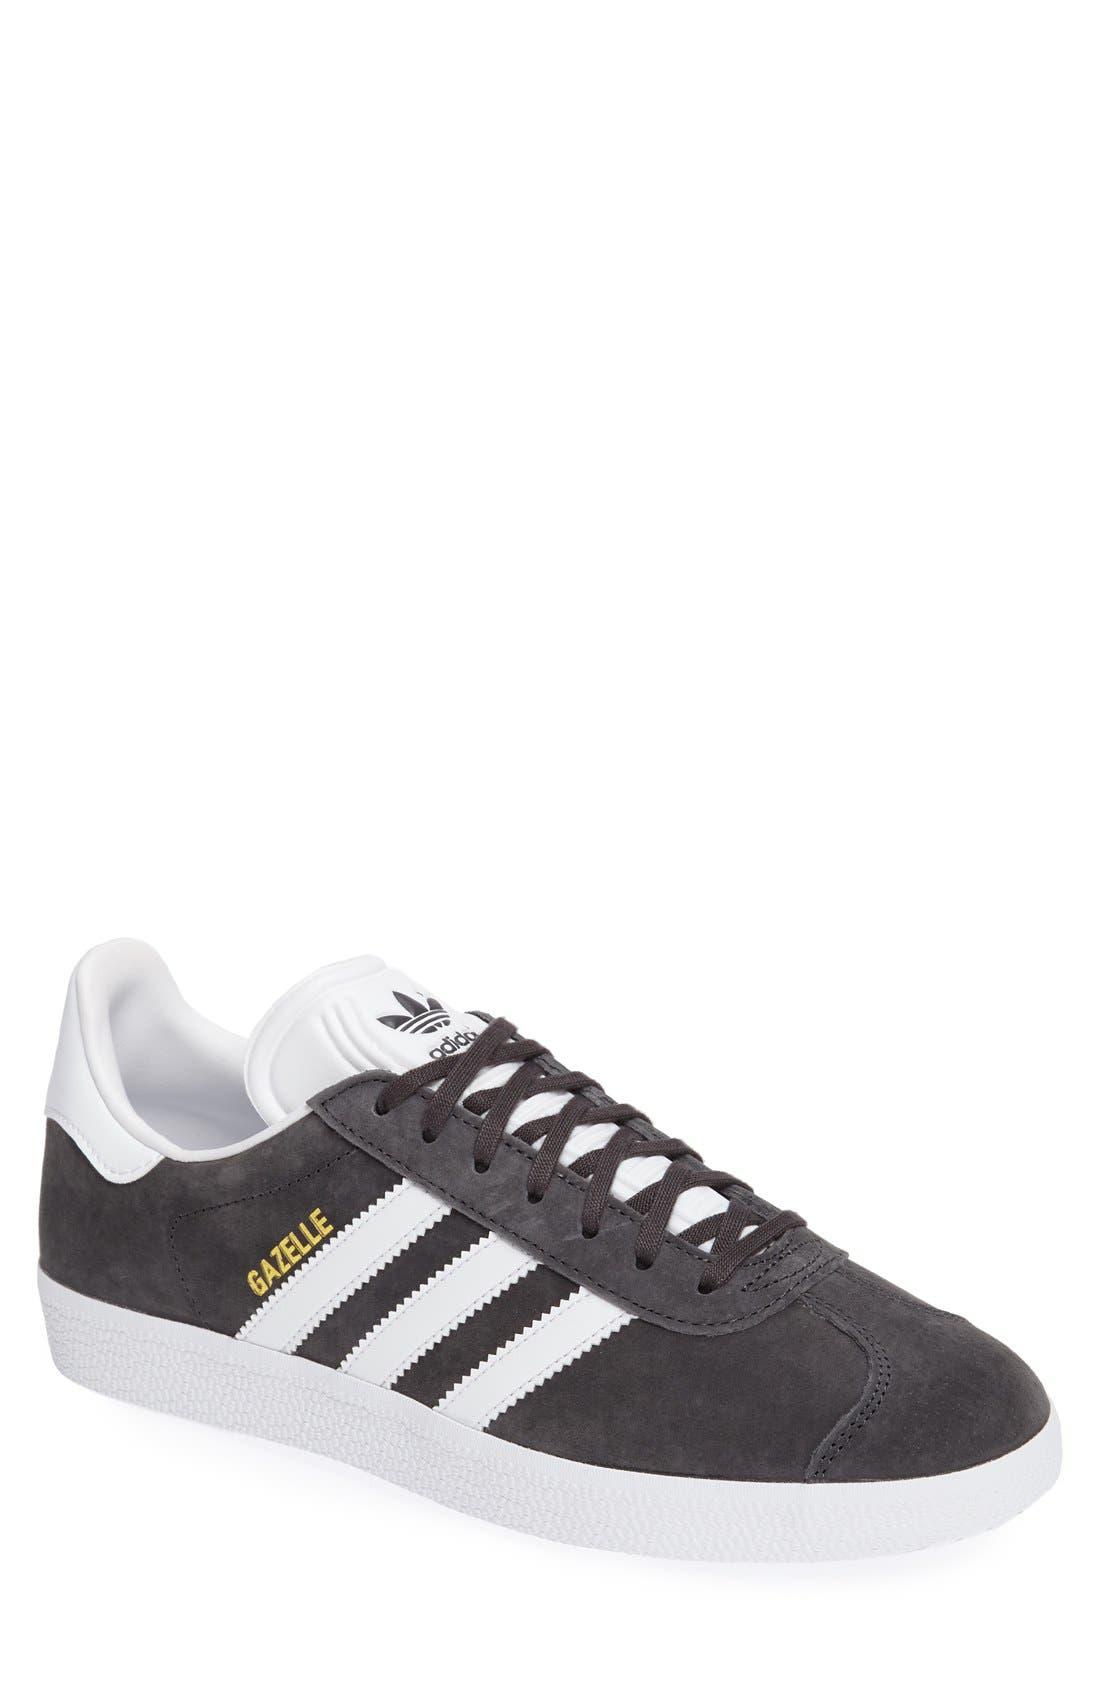 Gazelle Sneaker,                         Main,                         color, 020